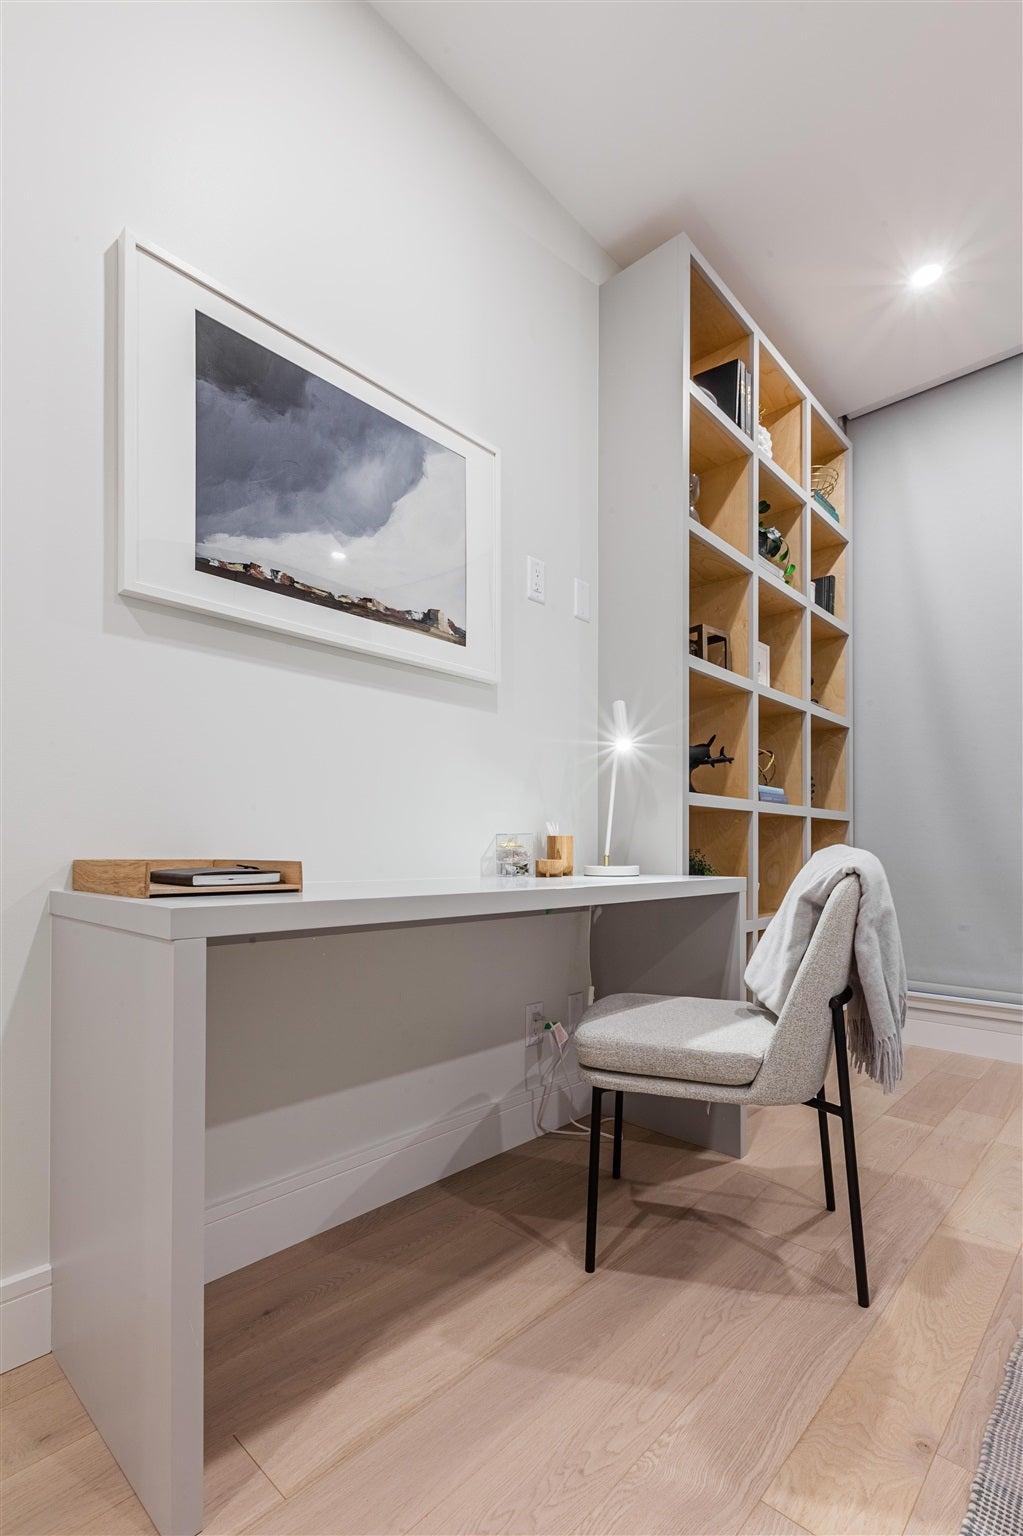 502 20416 PARK AVENUE - Langley City Apartment/Condo for sale, 3 Bedrooms (R2603603) - #33